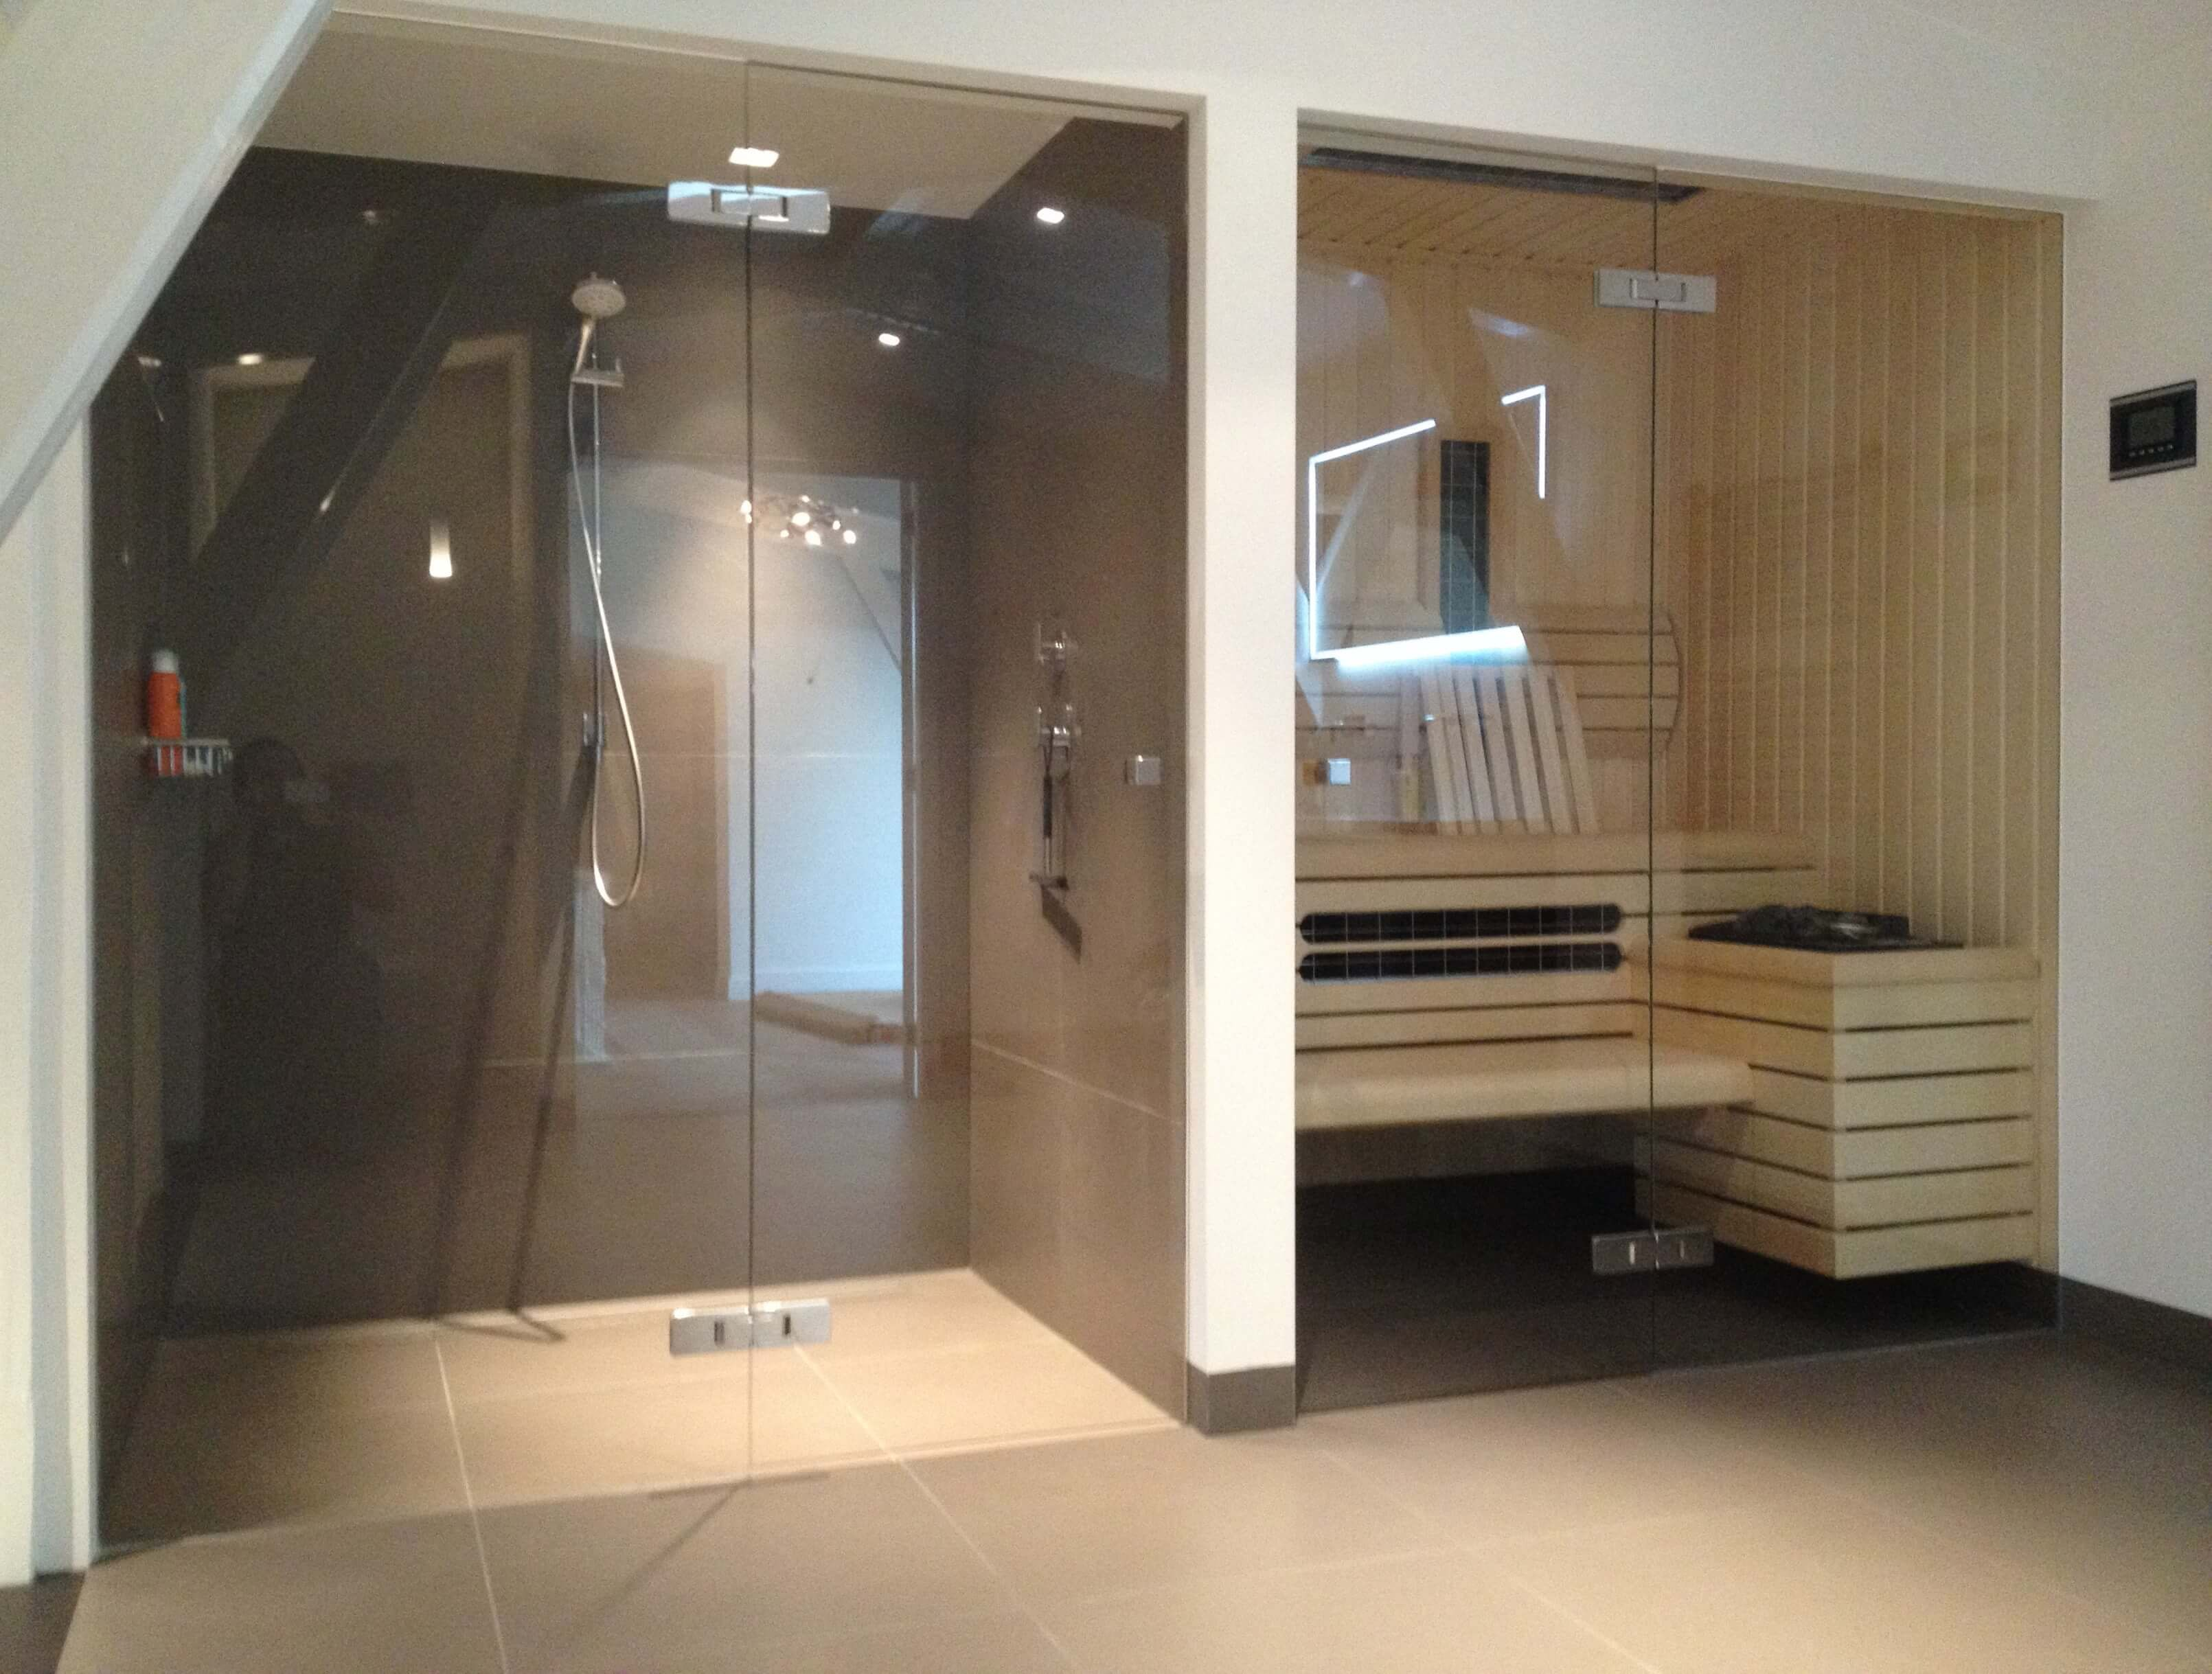 Sauna Inbouwen Badkamer : Sauna in badkamer badkamer saunas modern saunas